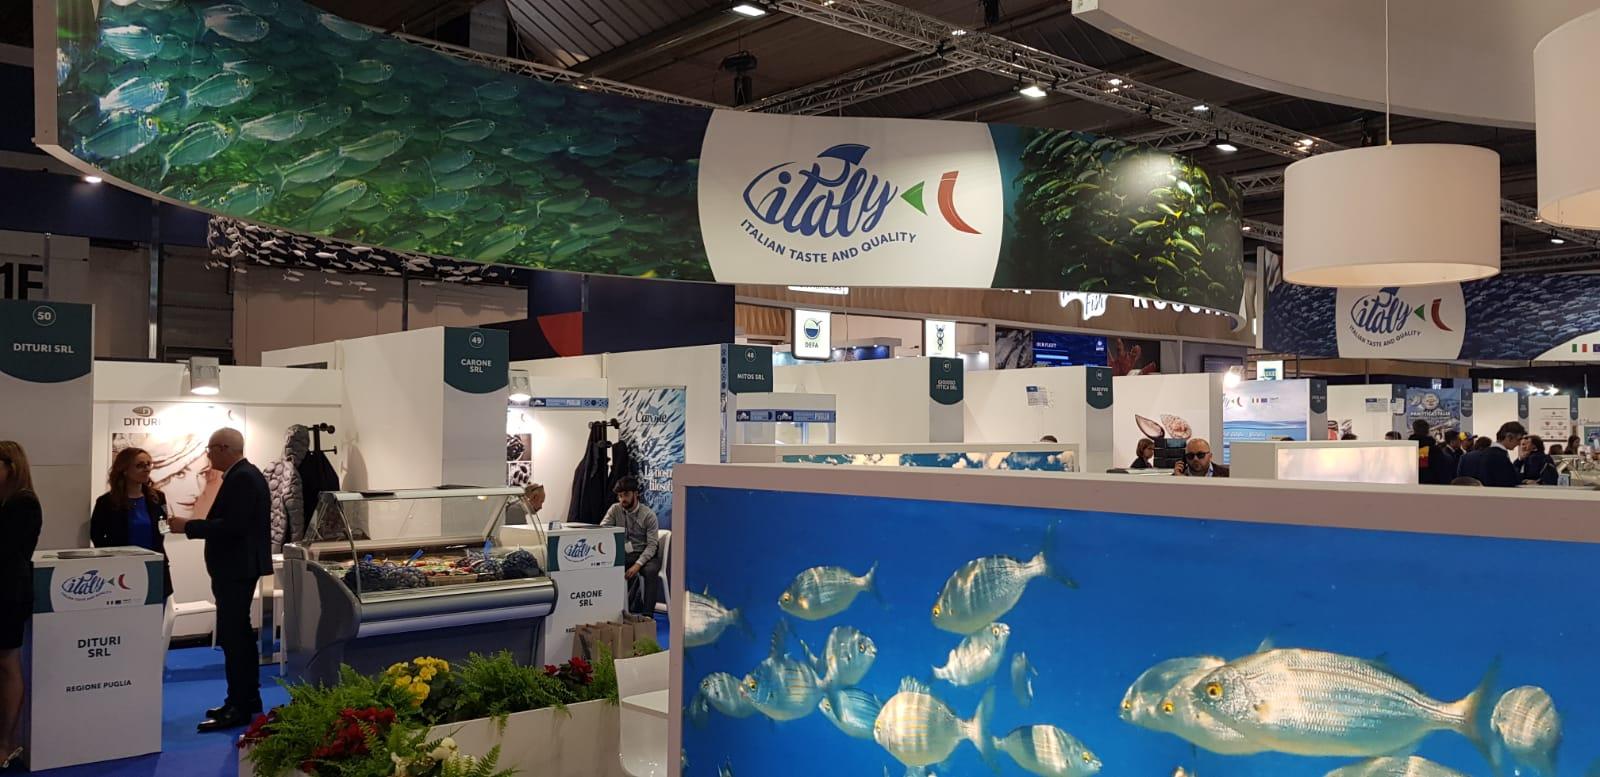 Calendario Fiere Alimentari 2020.Aquafarm 2020 Parte Da Bruxelles Pordenone Fiere